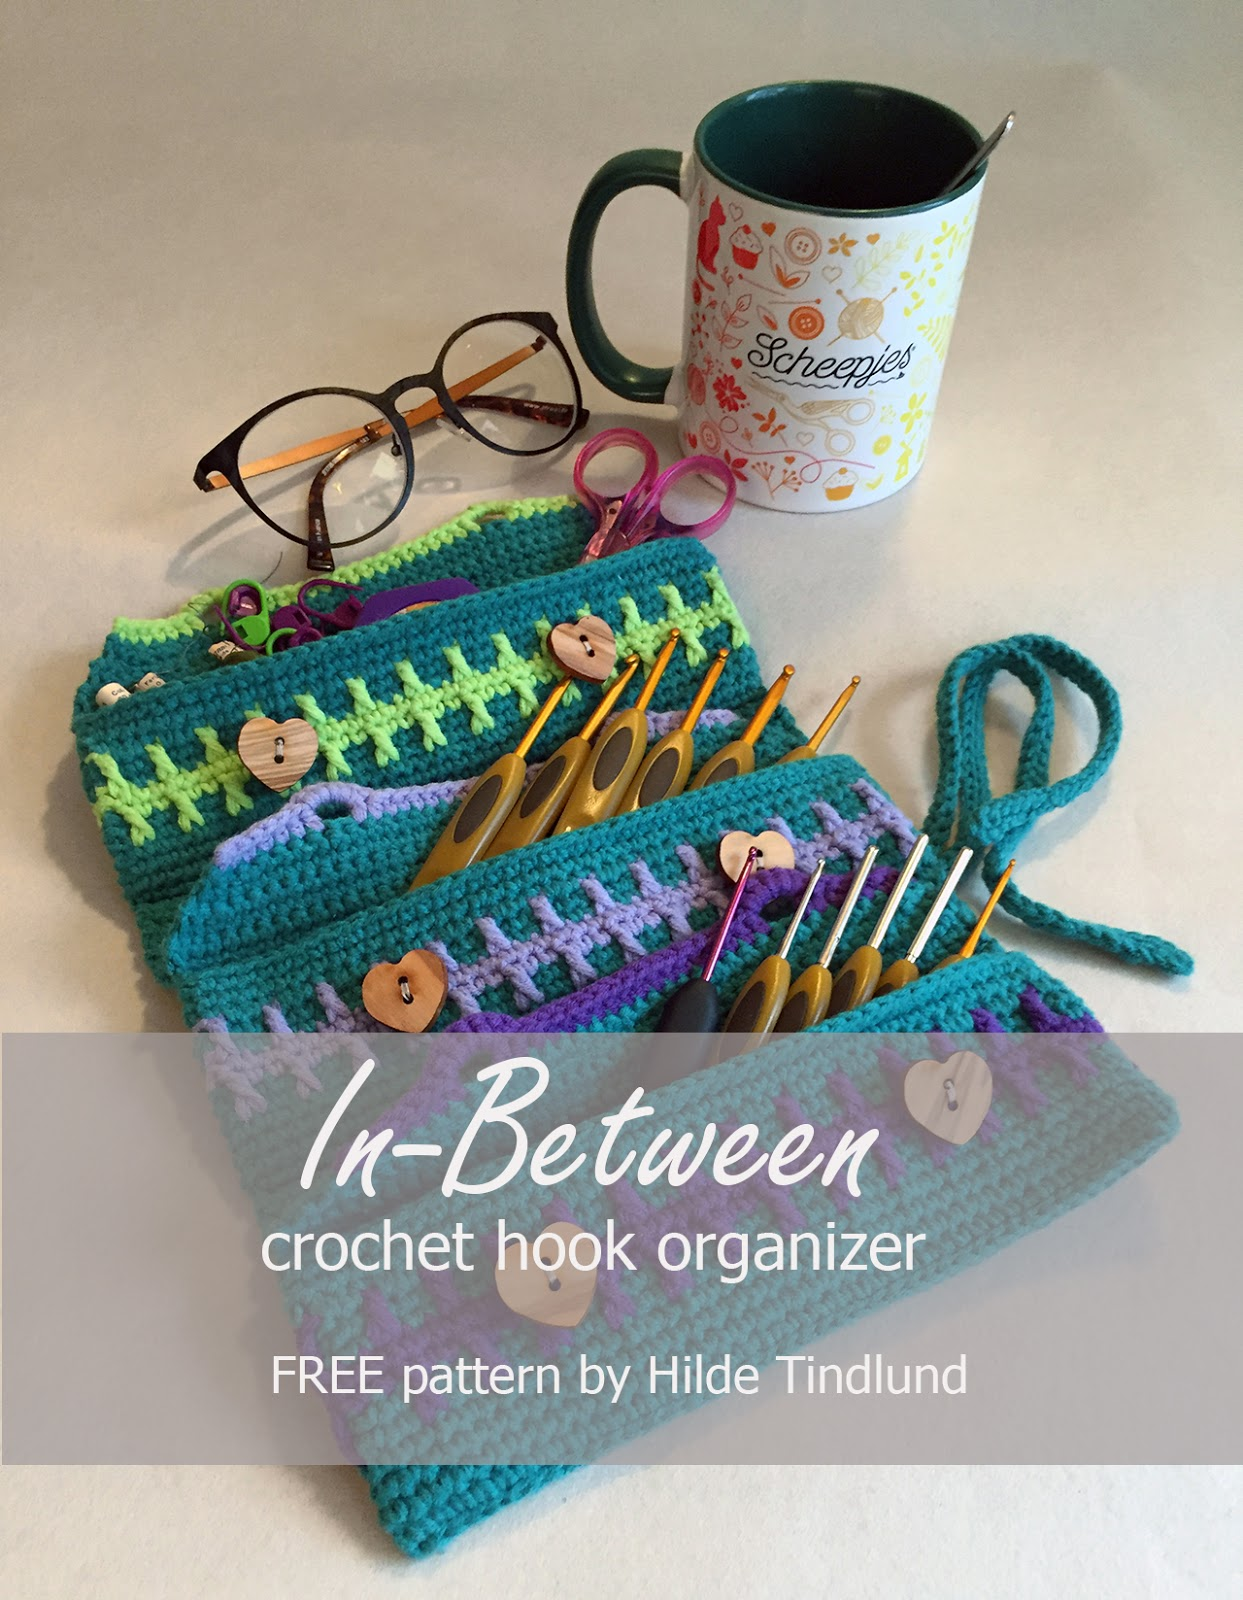 In Between Crochet Hook Organizer Free Pattern By Hilde Tindlund